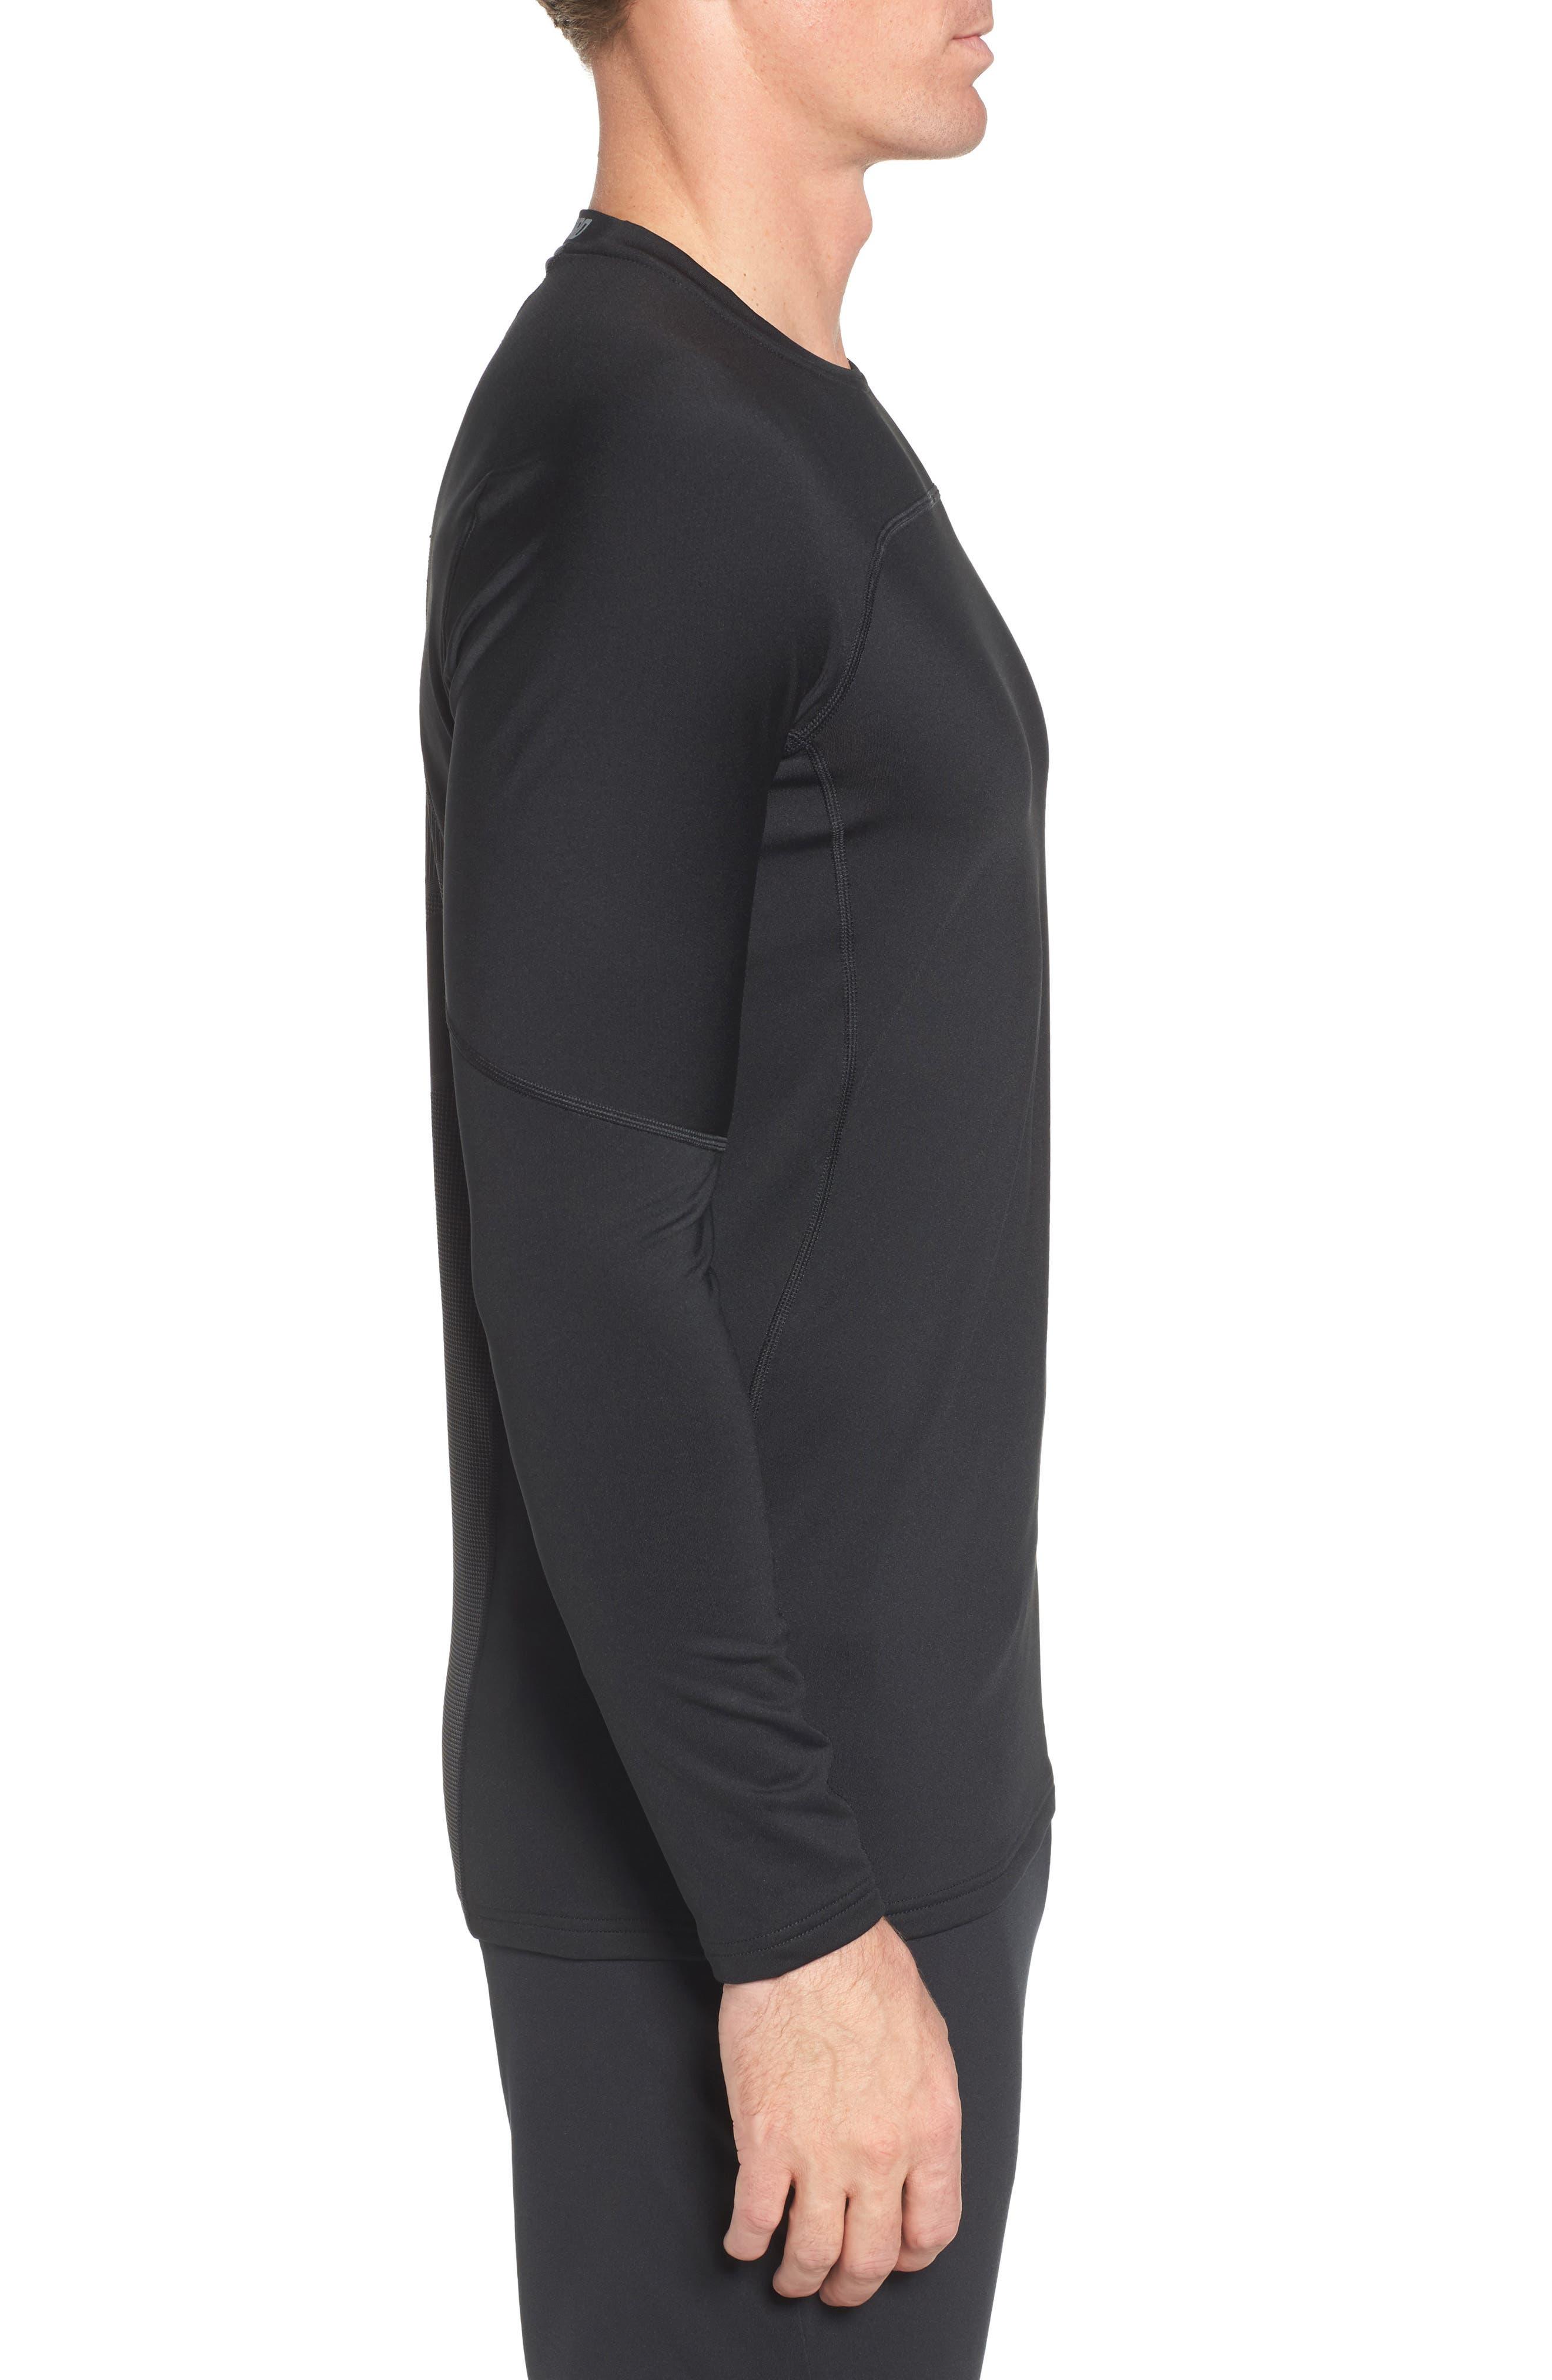 Pro Long Sleeve Training T-Shirt,                             Alternate thumbnail 3, color,                             010